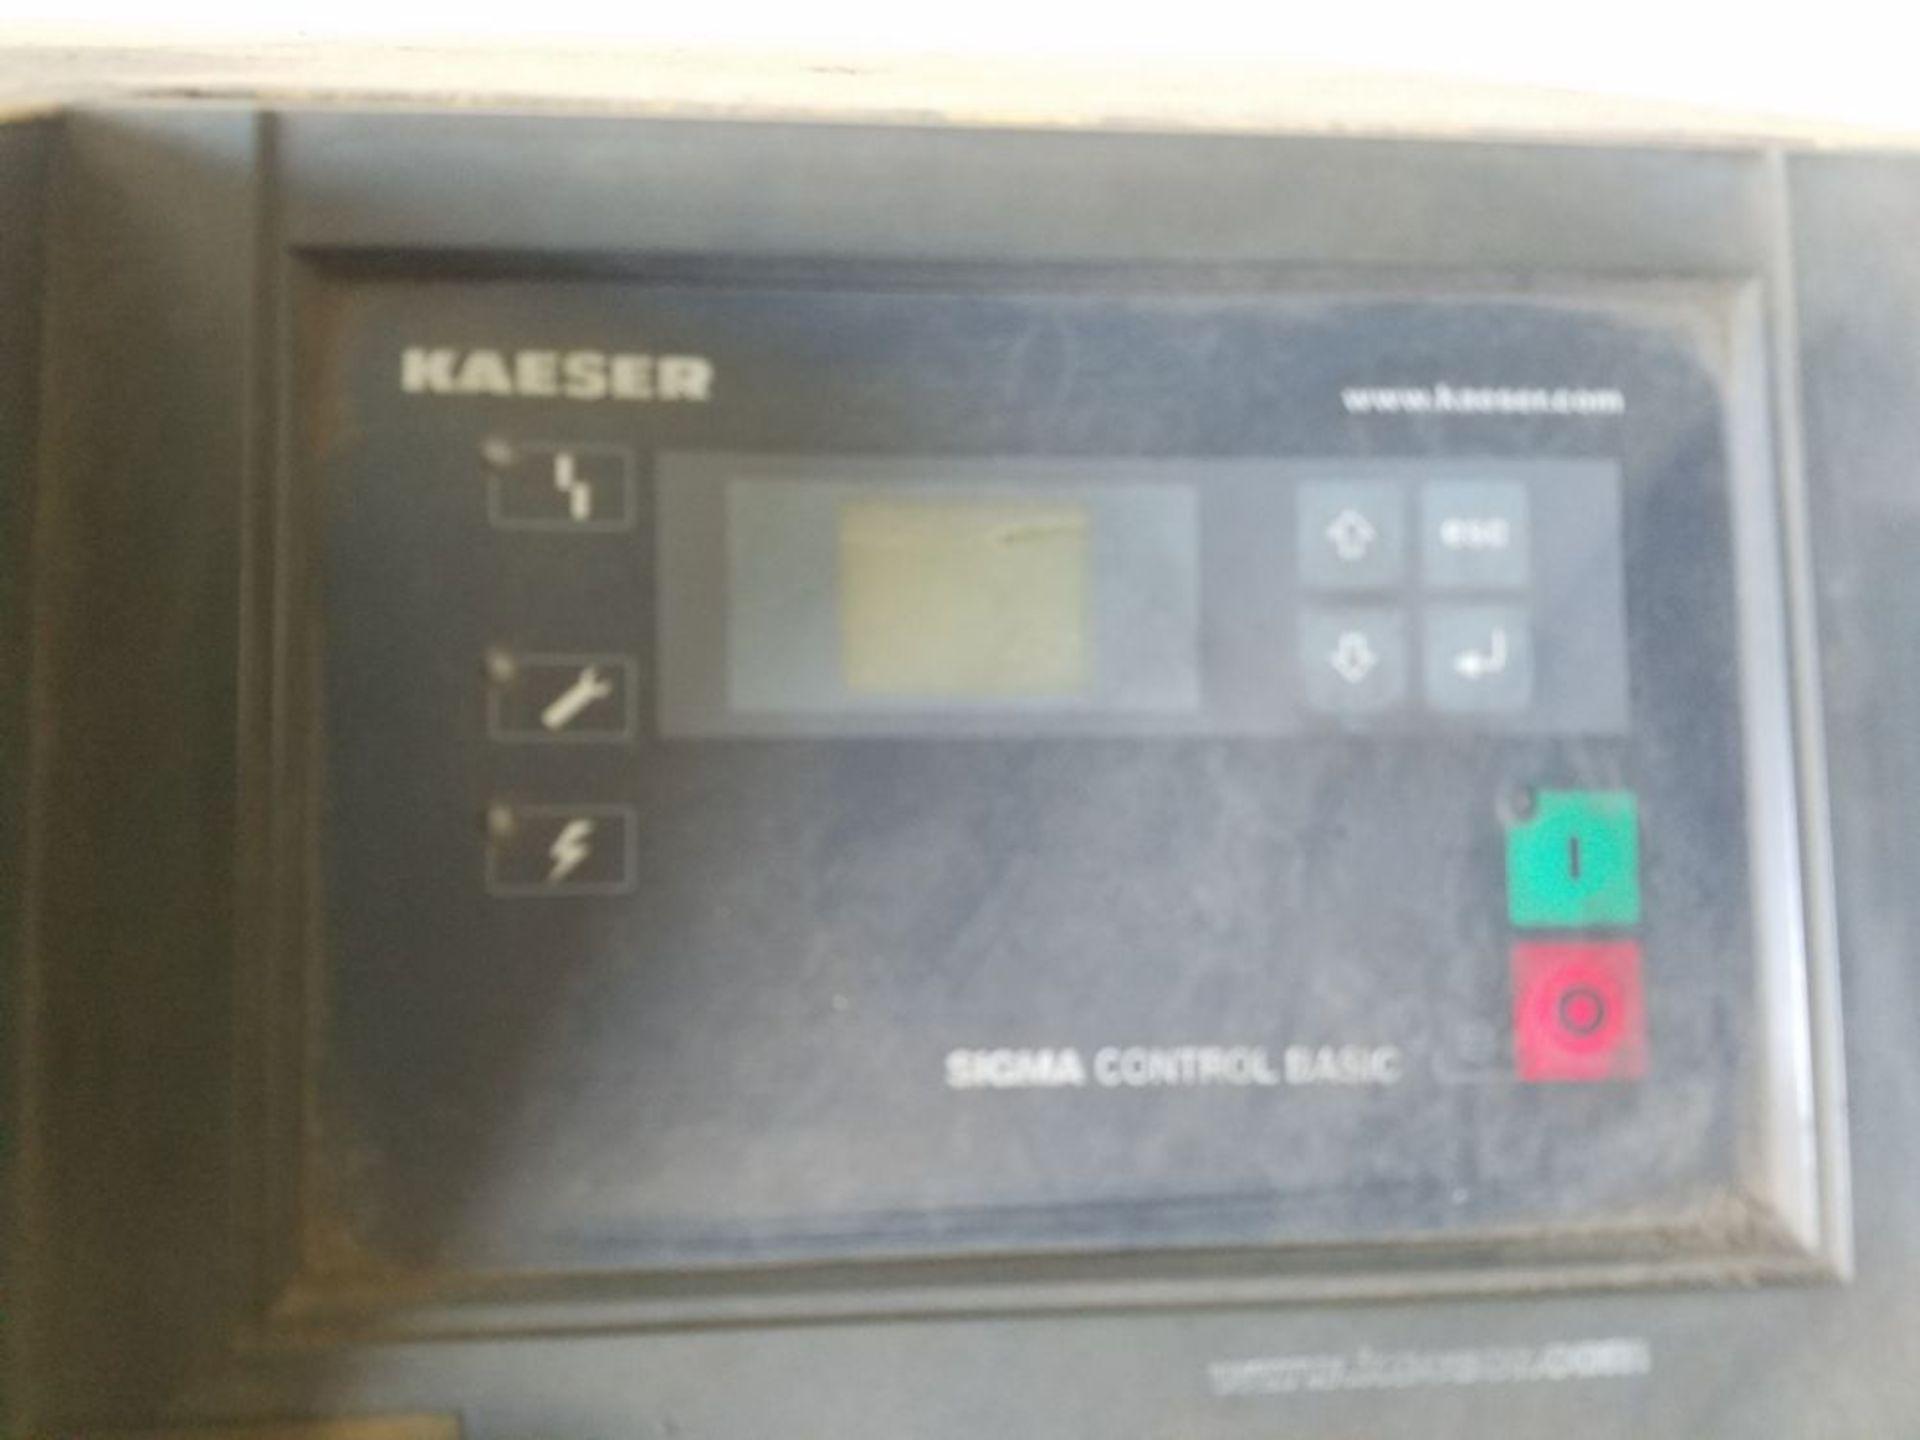 (2005) Kaeser mod. TA-11 and SMII, 10hp Rotary Screen Air Compressor - Image 3 of 4